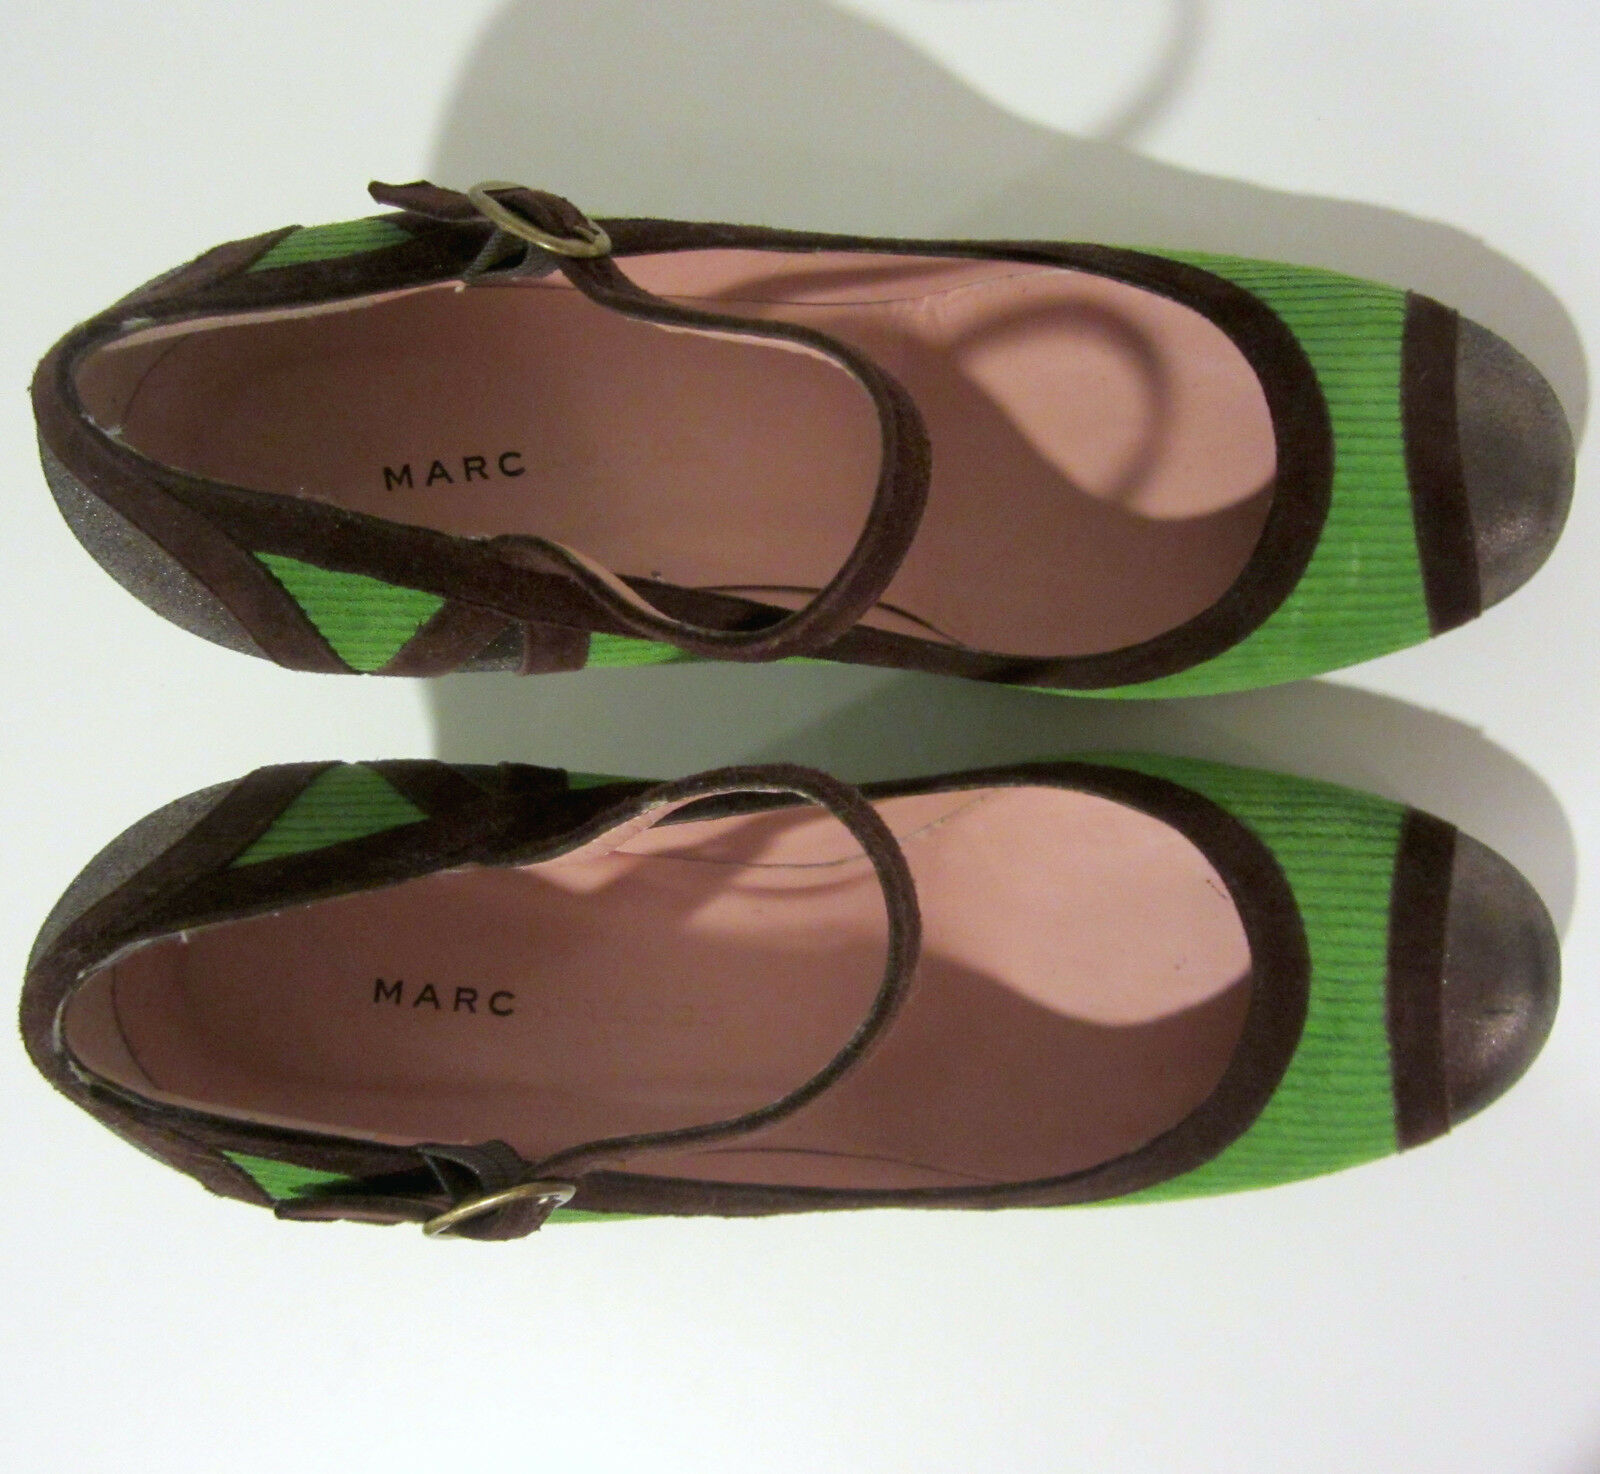 Marc by Marc Jacobs Grün heels heels heels 9.5 US 39.5 EU corduroy cap toe schuhe NEW  375 33222a